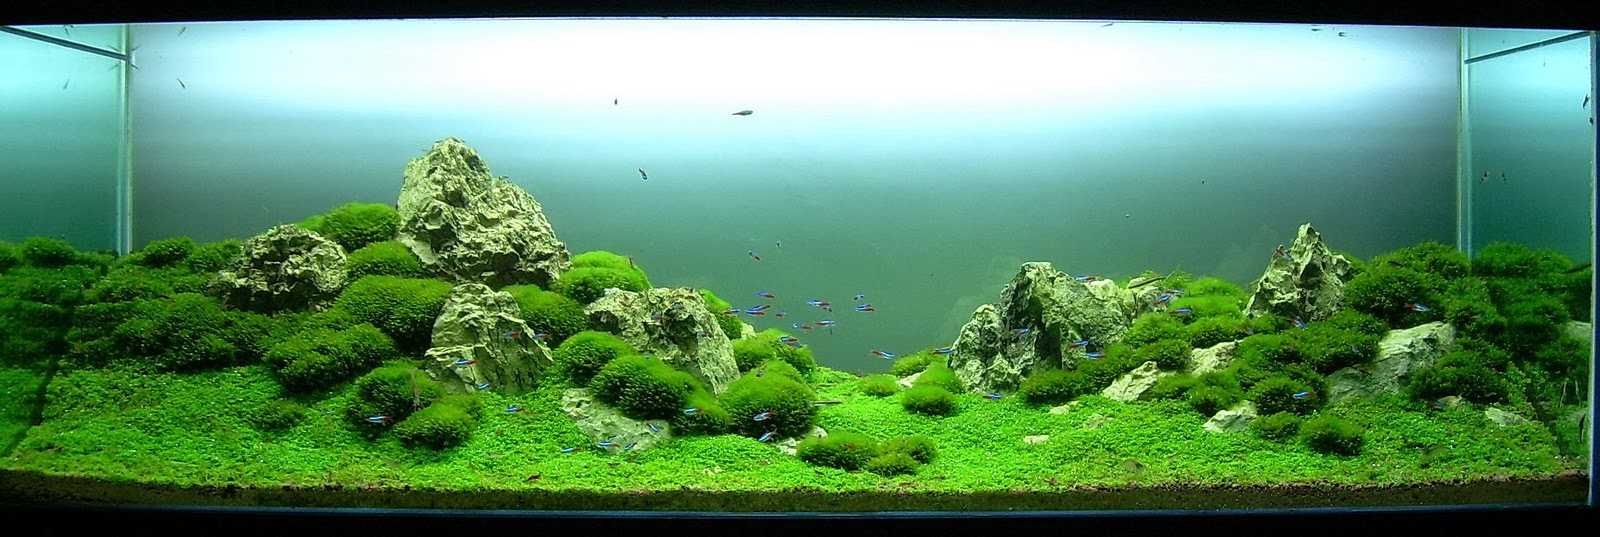 Dunia Aquascape R E N Shop And Gallery